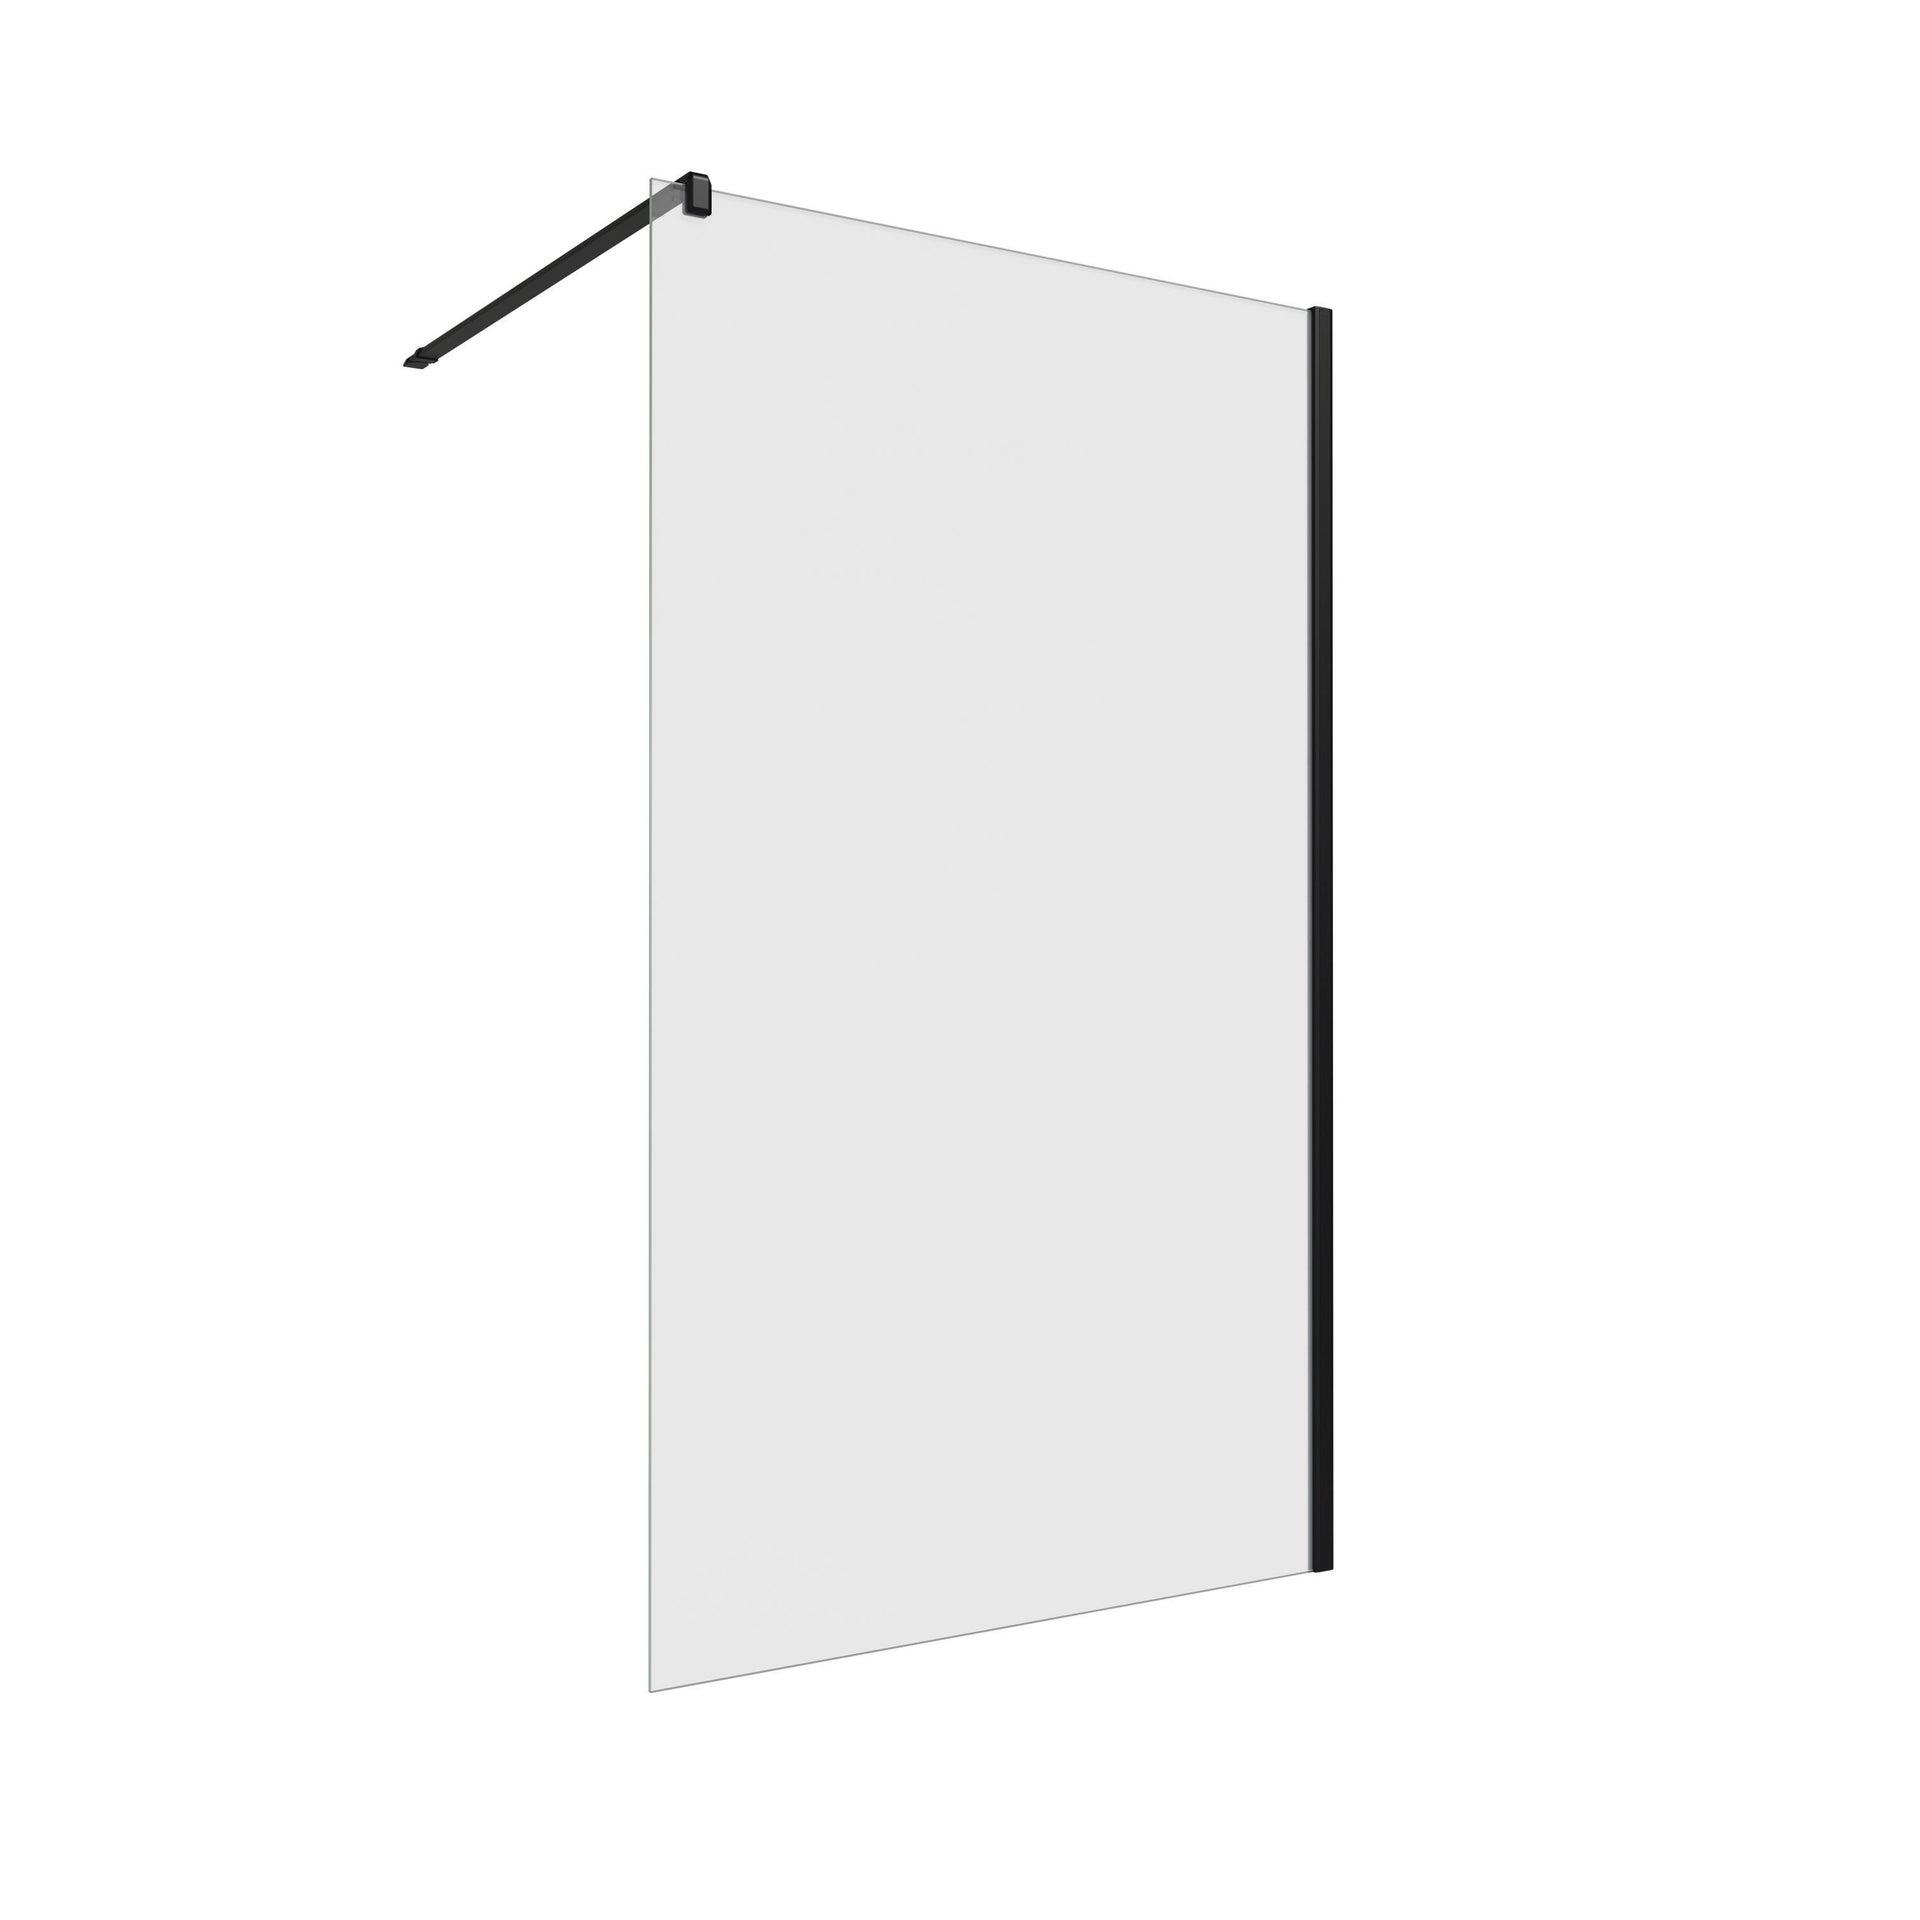 Doccia walk in L 118, H 200 cm, vetro 8 mm trasparente nero - 1